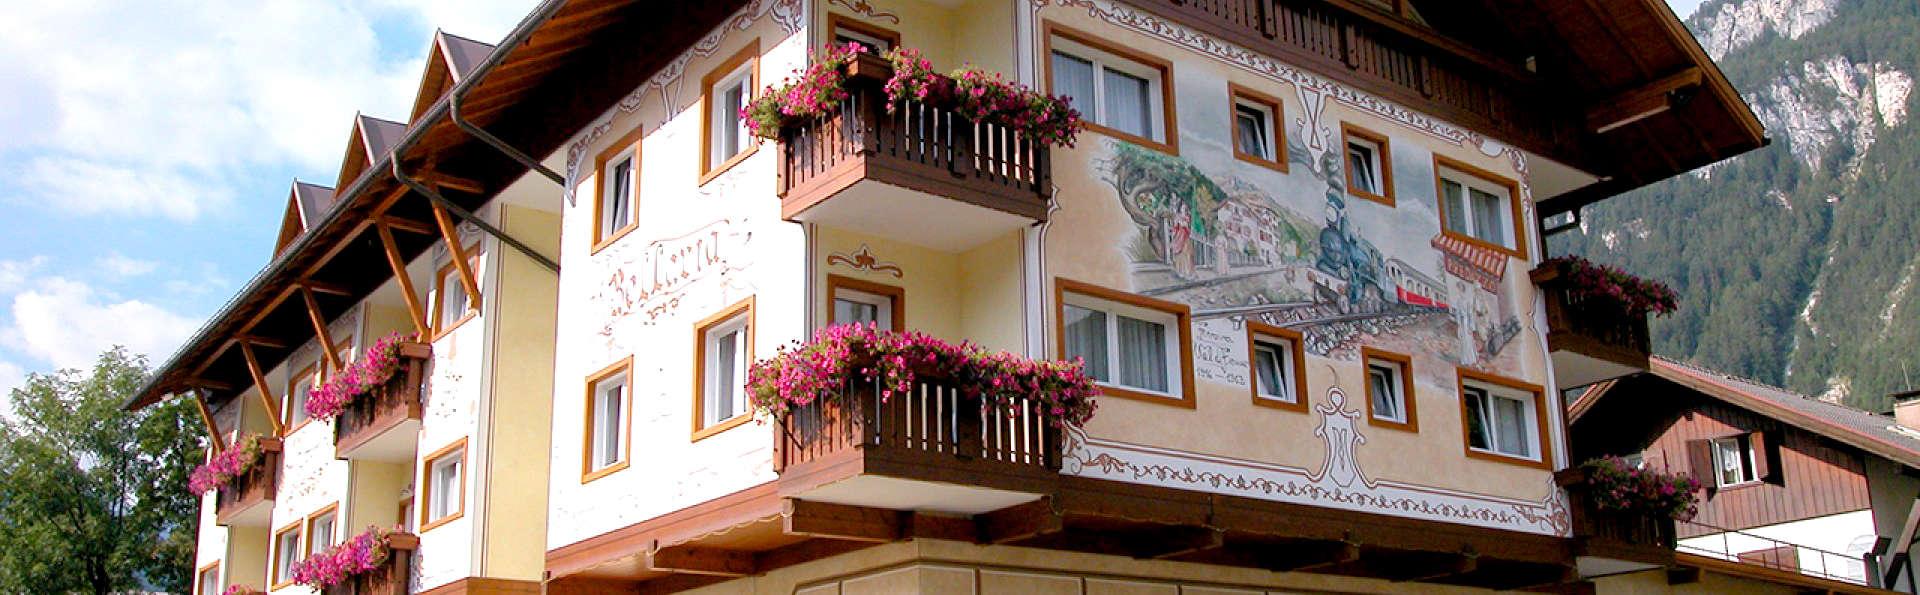 Hotel Bellaria - Edit_Front.jpg